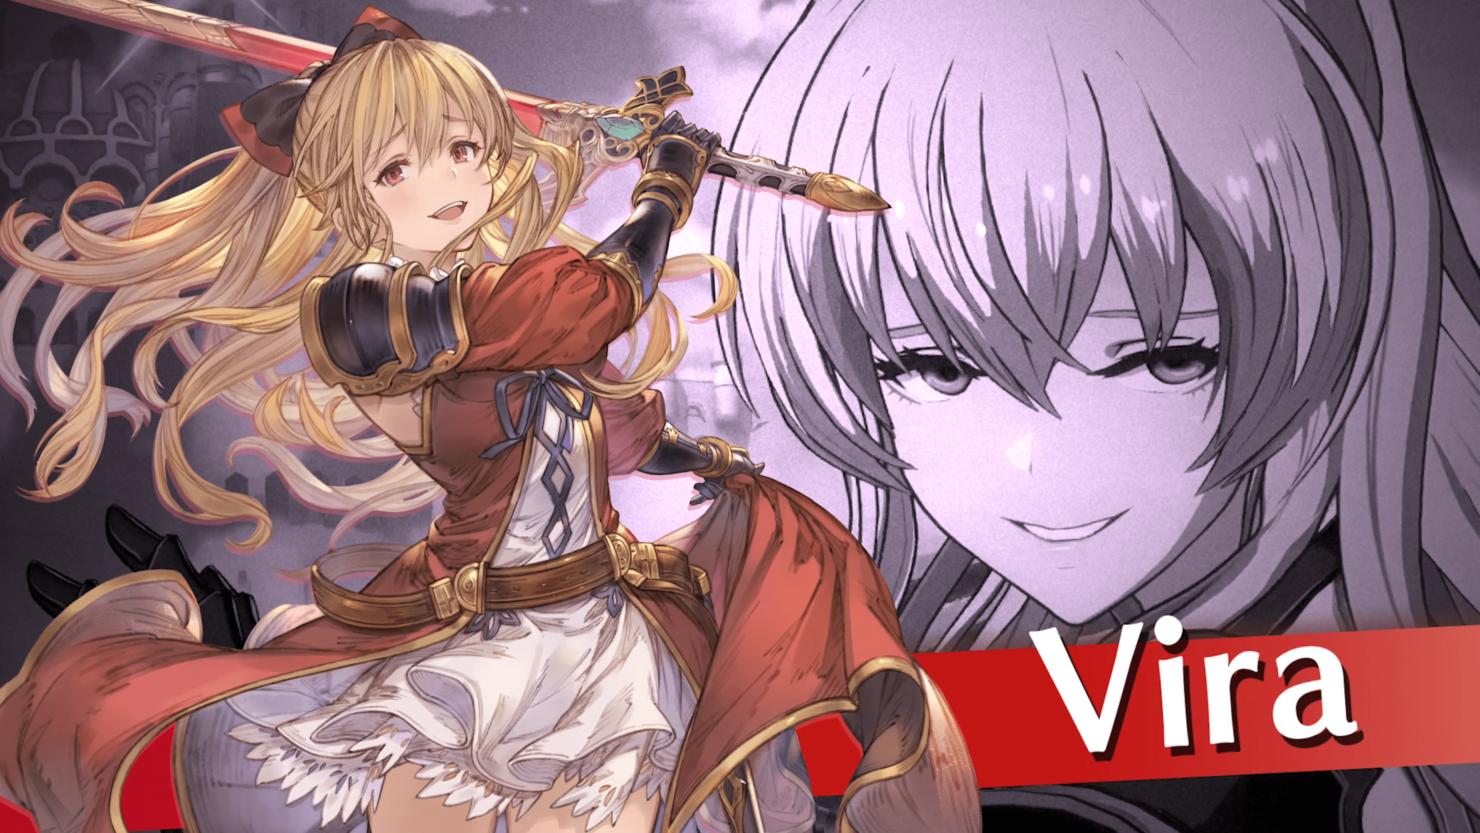 Granblue Fantasy Versus Vira